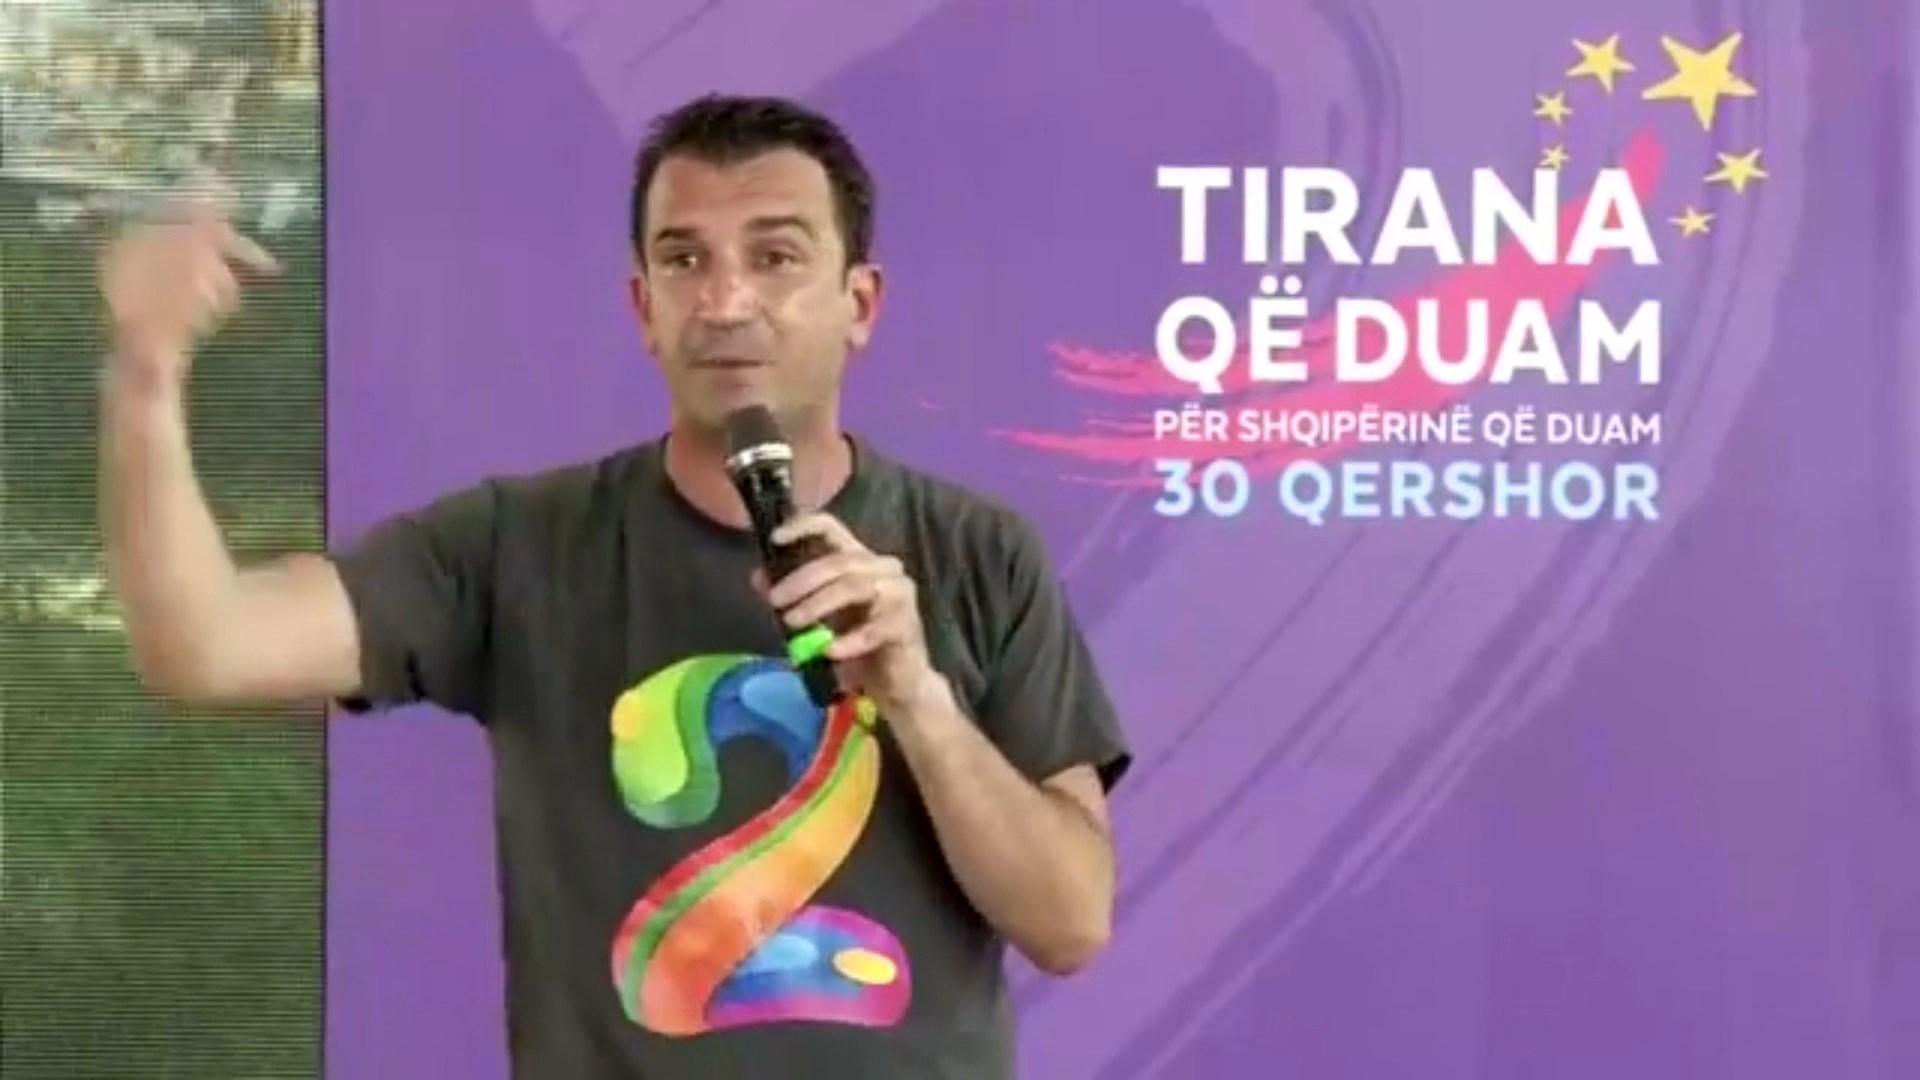 Gjykata e Tiranës njeh Erjon Veliajn si kryebashkiak